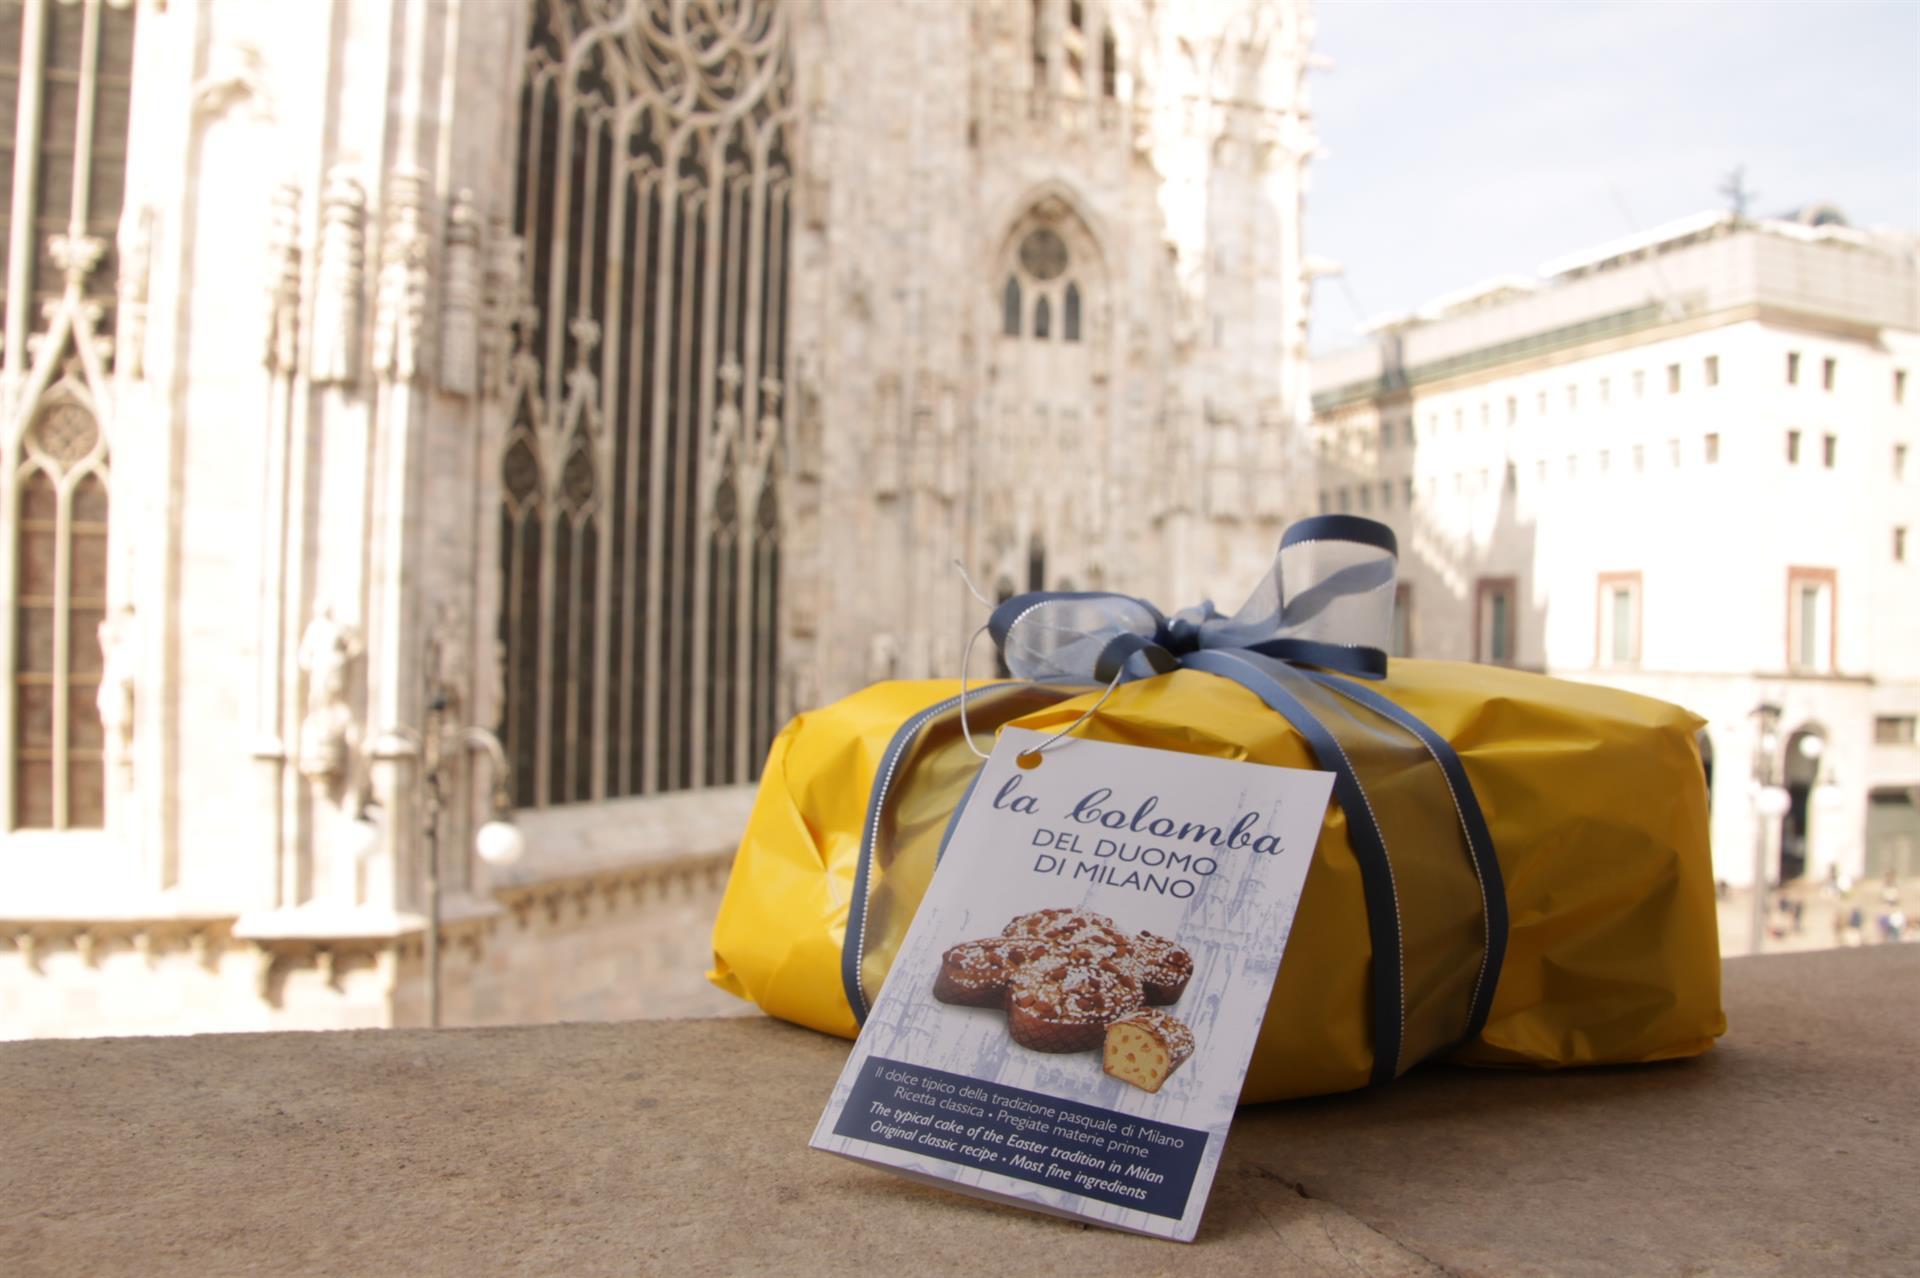 La Colomba del Duomo